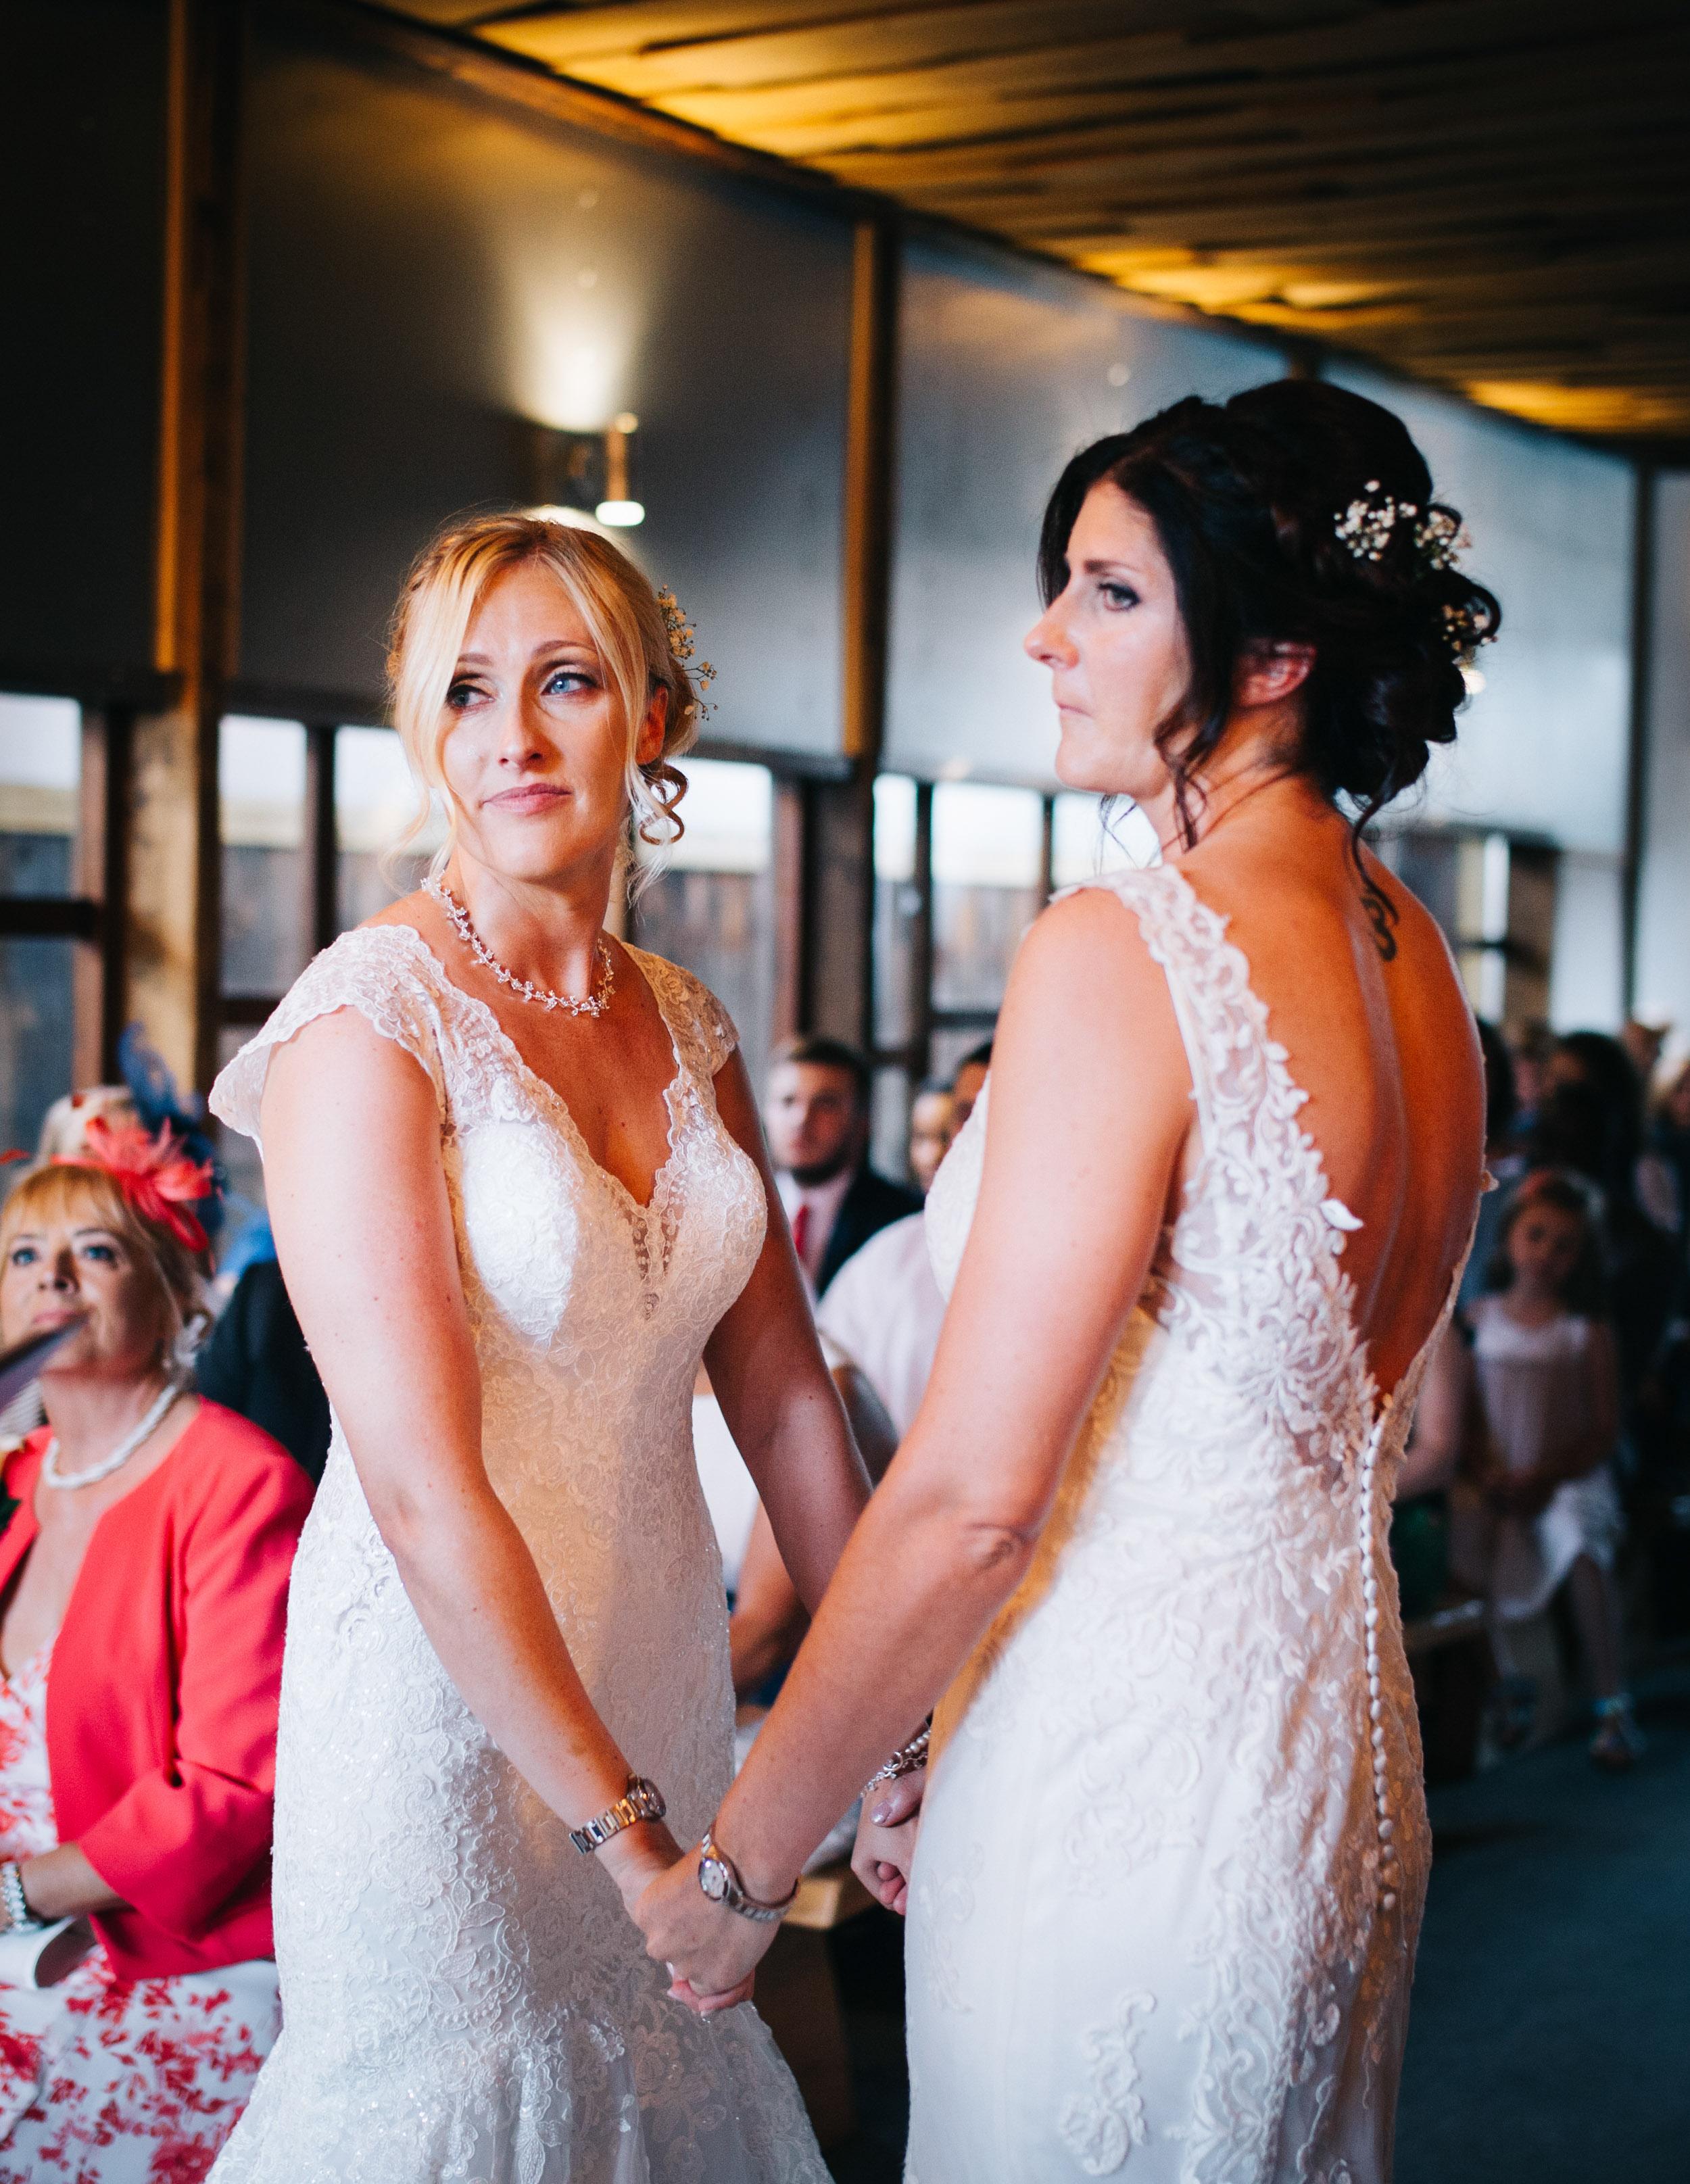 Cheshire wedding photographer - Owen House Wedding Barn